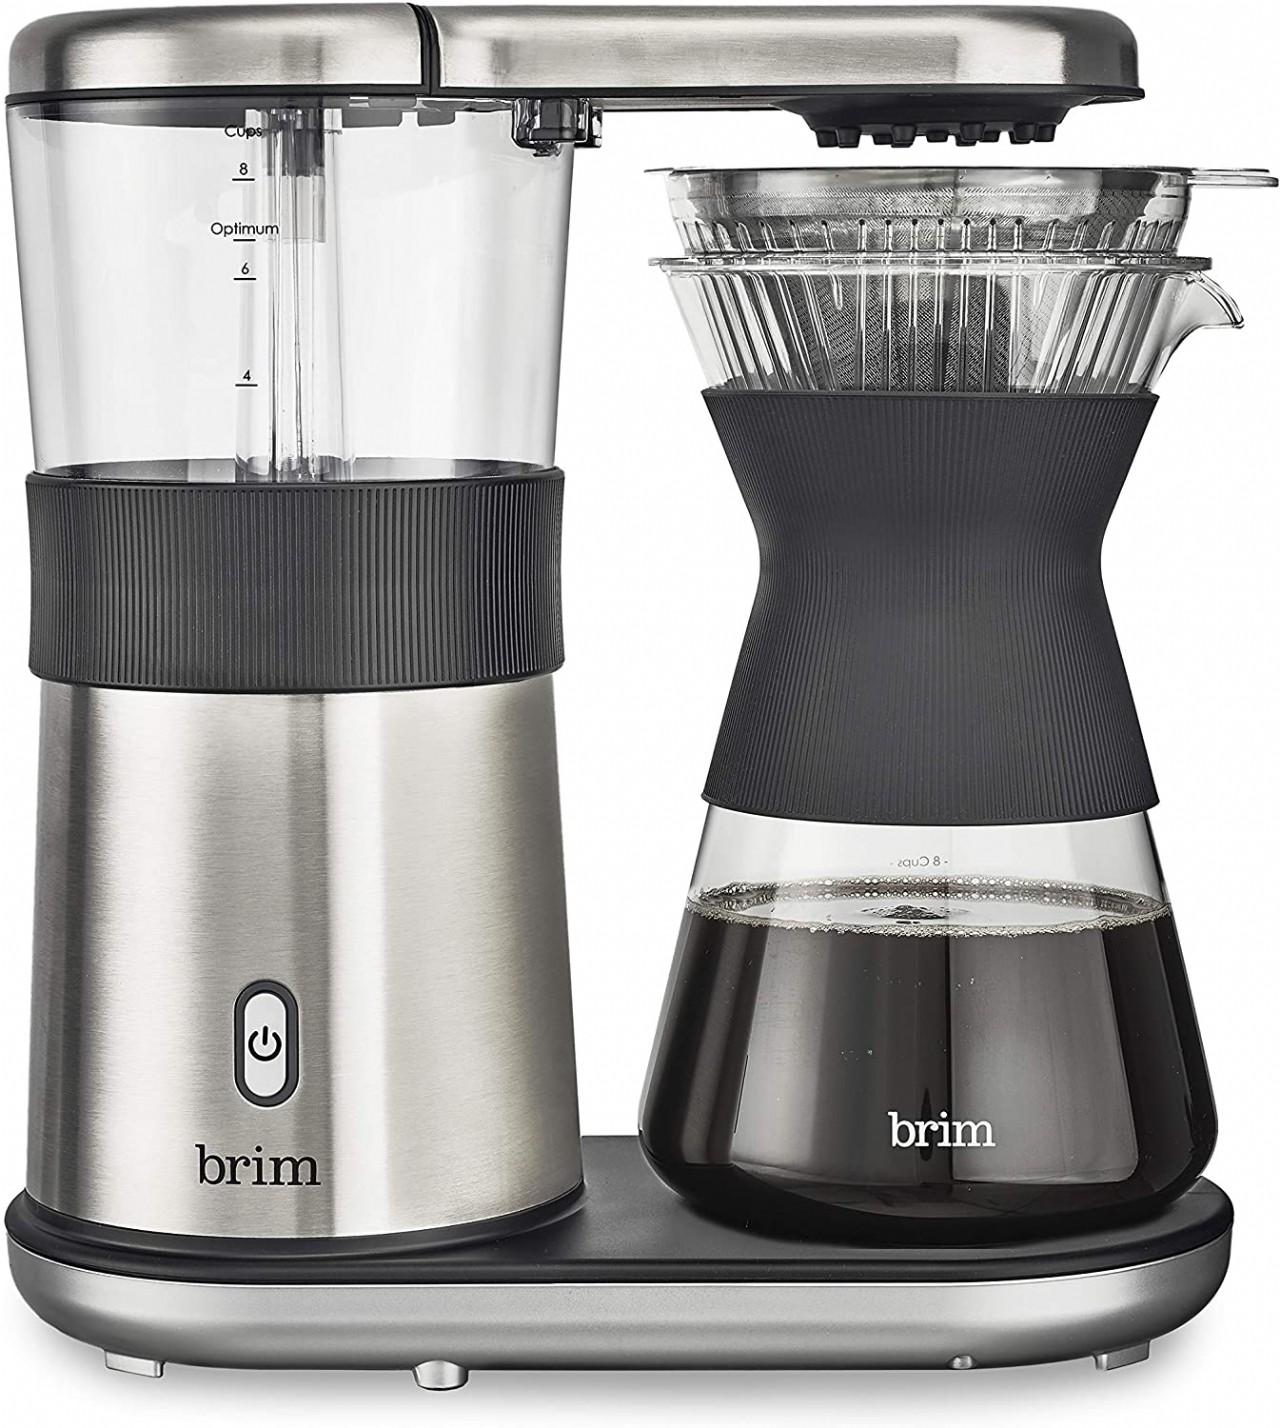 brim 8 Cup Pour Over Coffee Maker, Silver